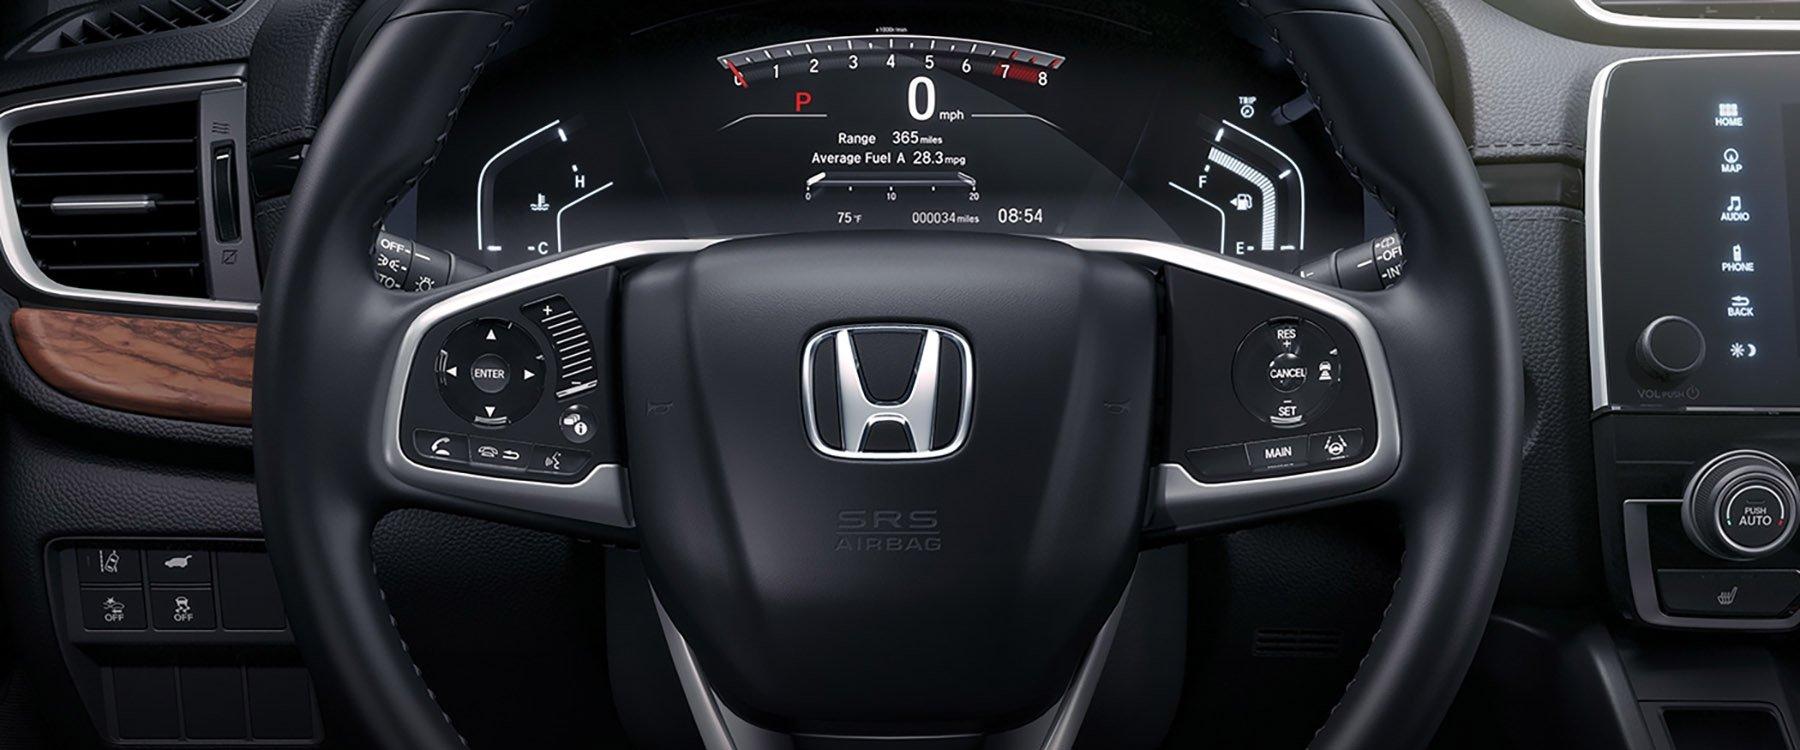 2017 Honda CR-V Tech Background